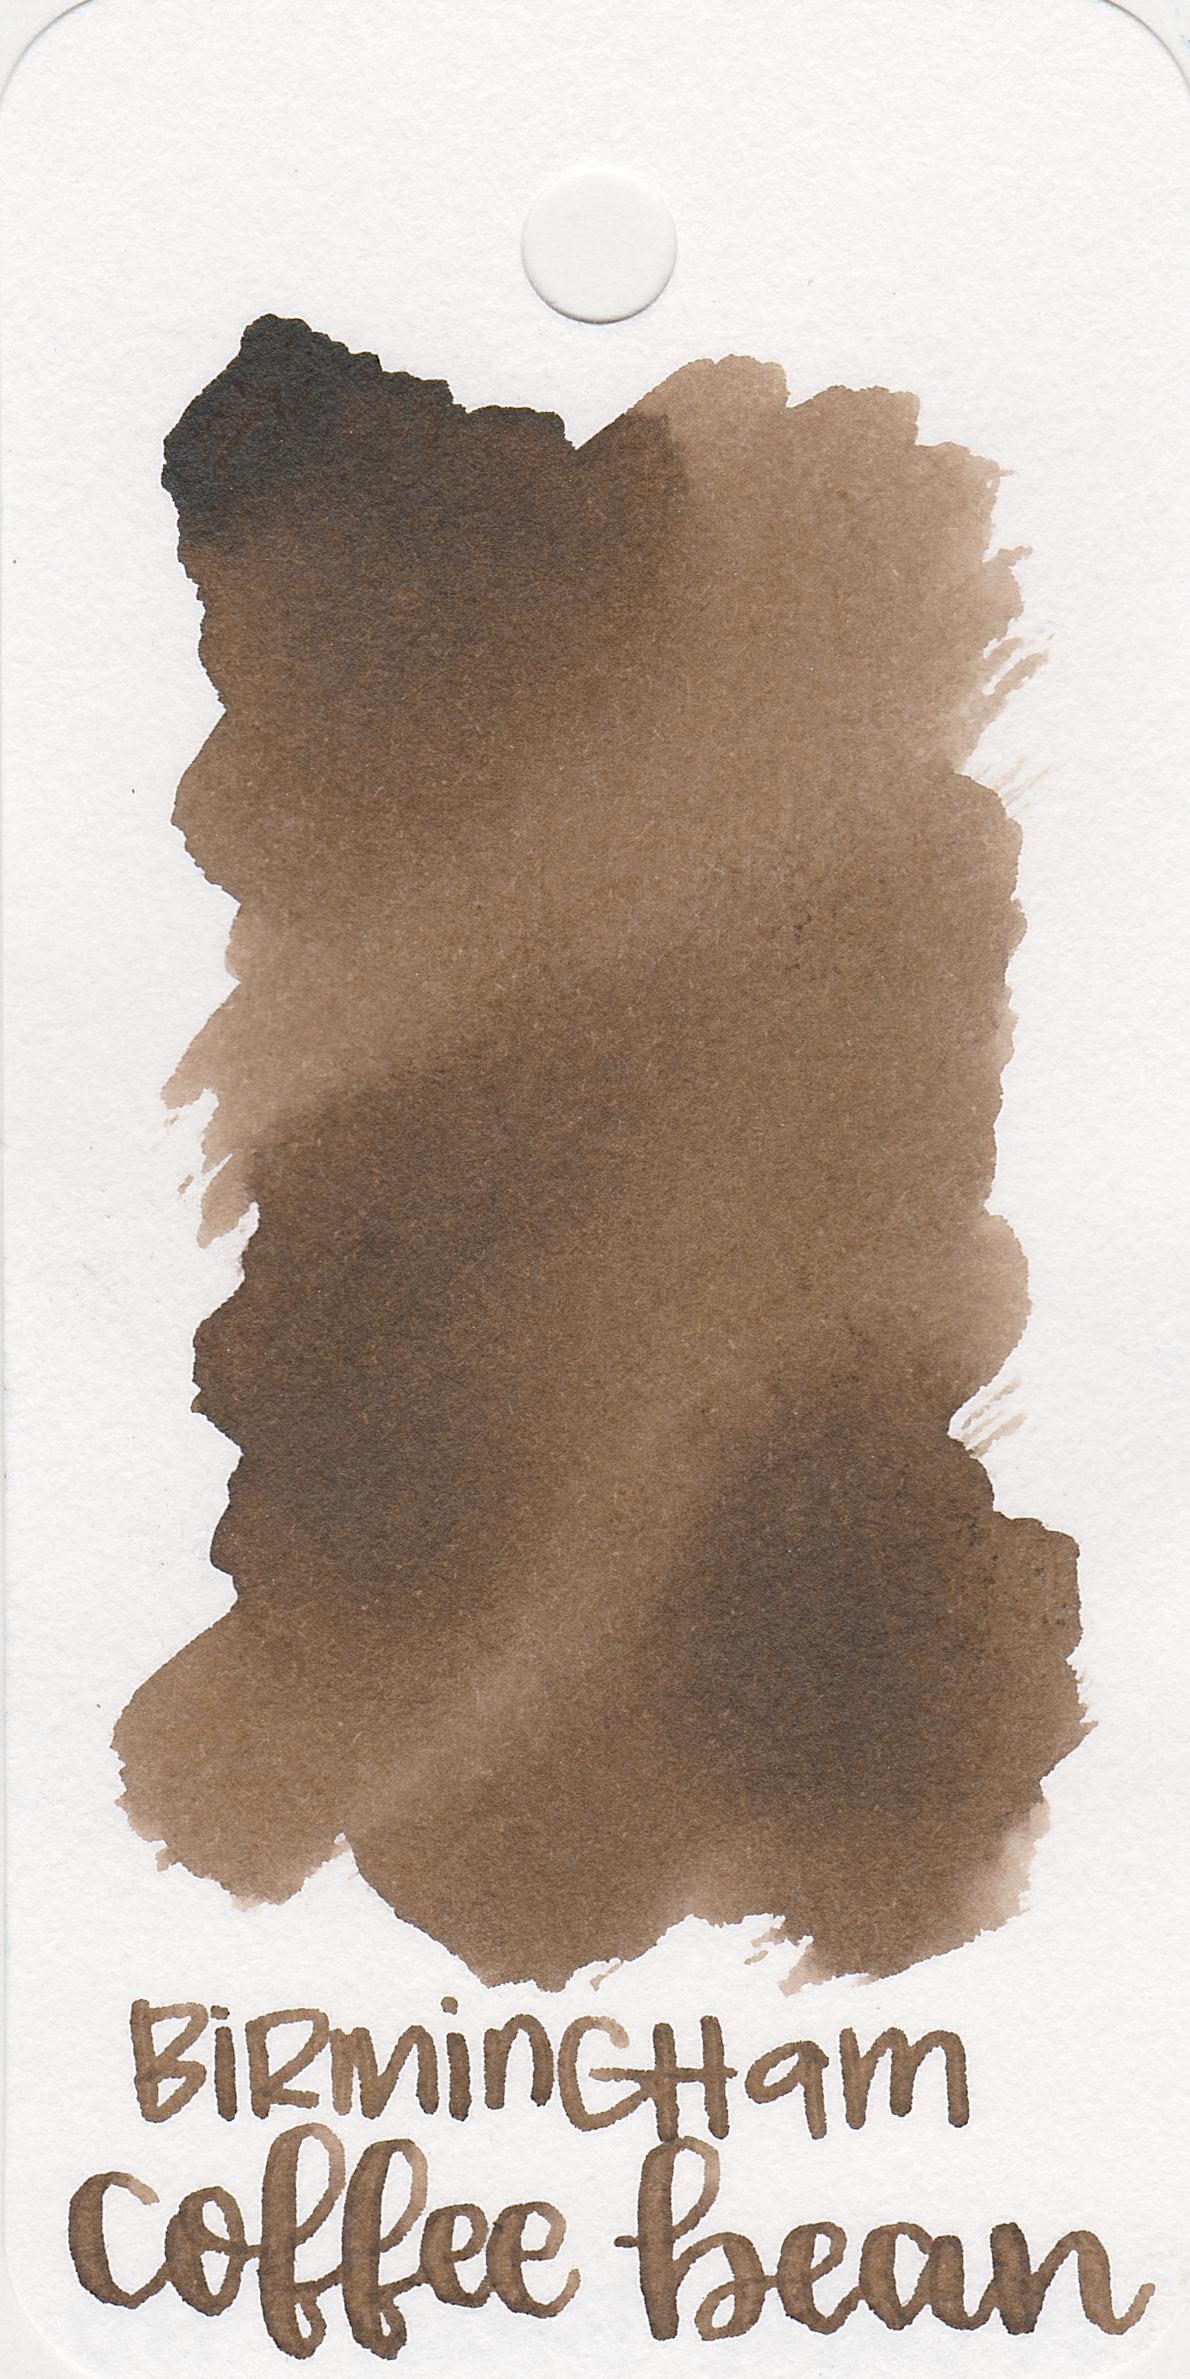 bp-coffee-bean-1.jpg